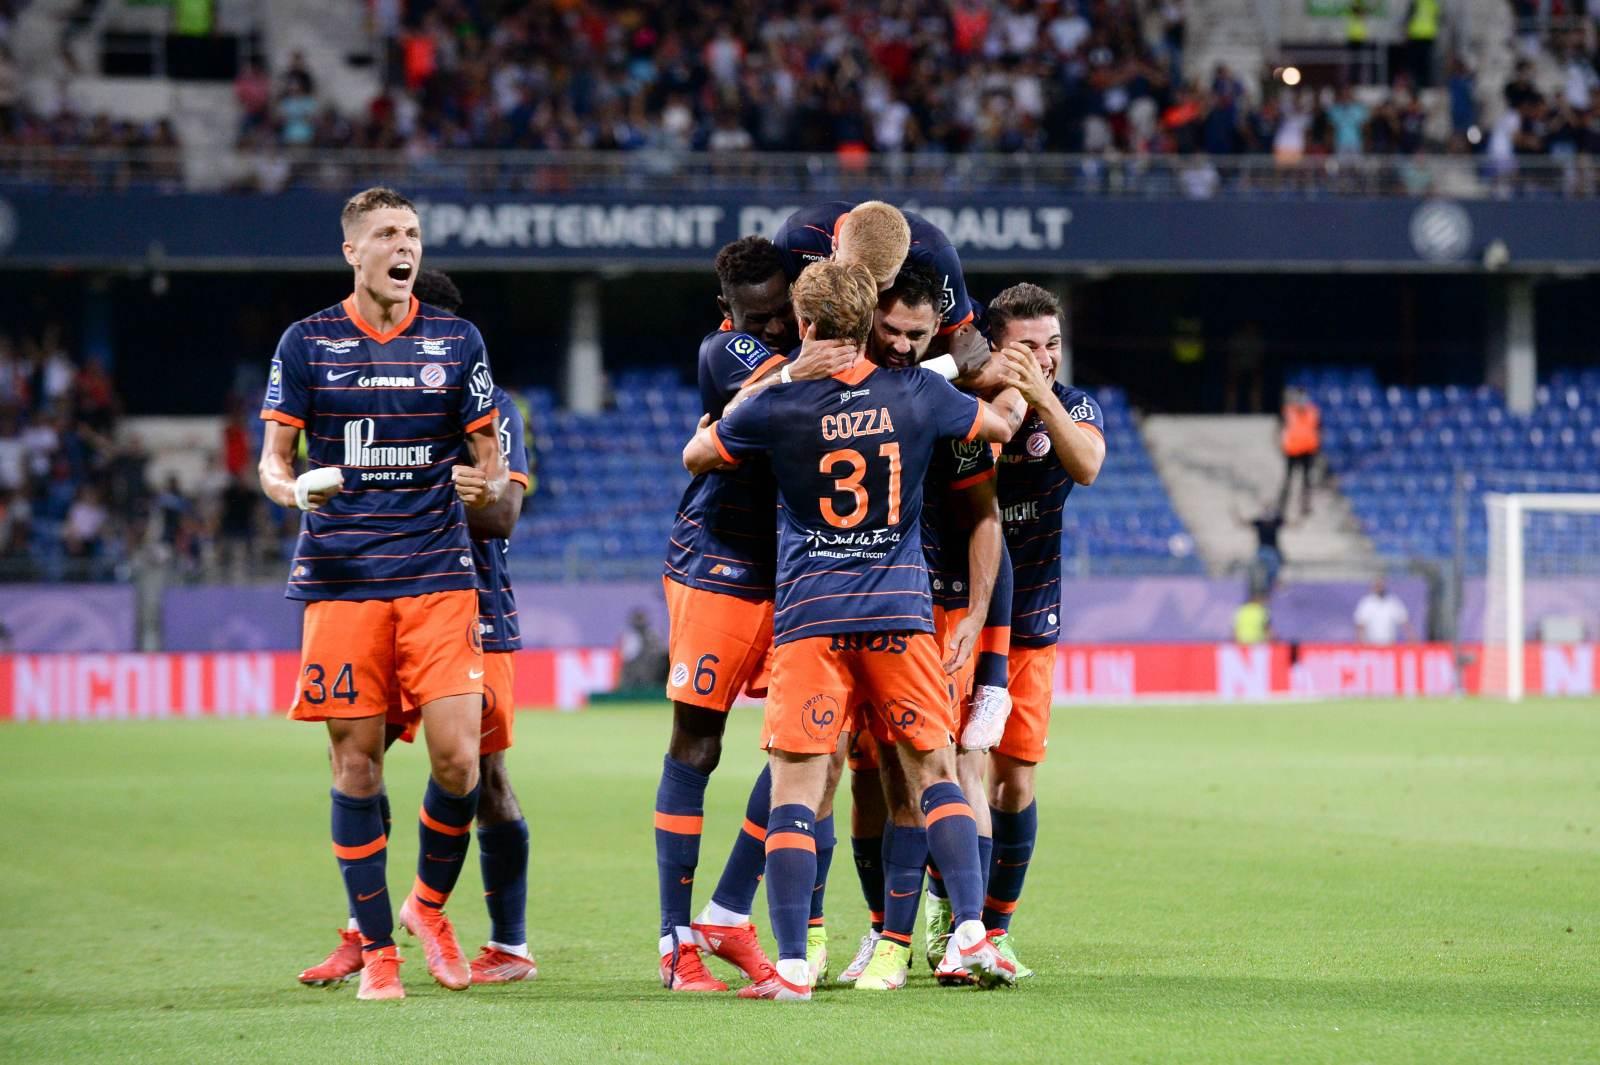 «Монпелье» - «Бордо»: прогноз и ставка на матч Лиги 1 – 22 сентября 2021